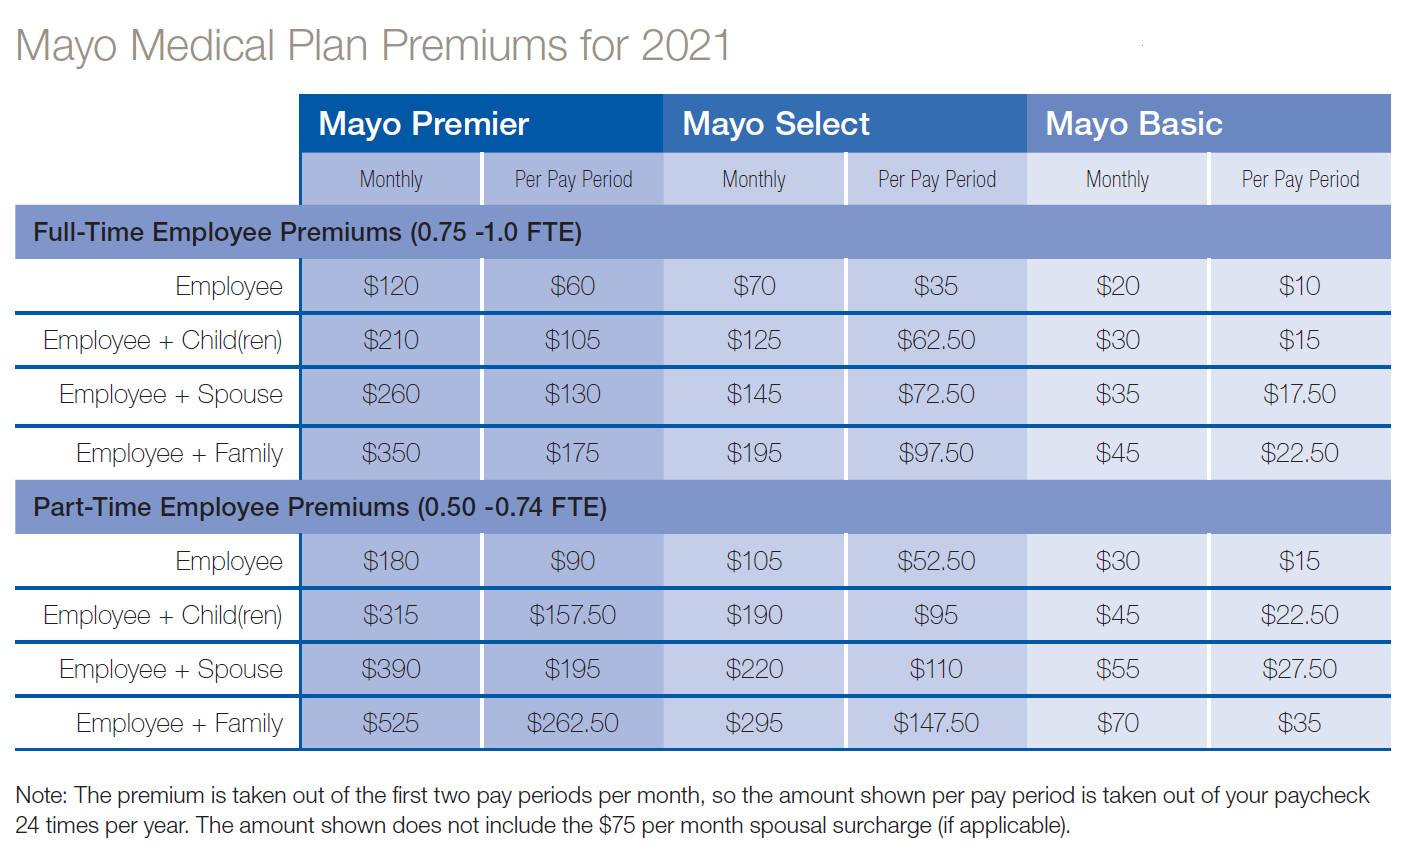 2021 Premiums